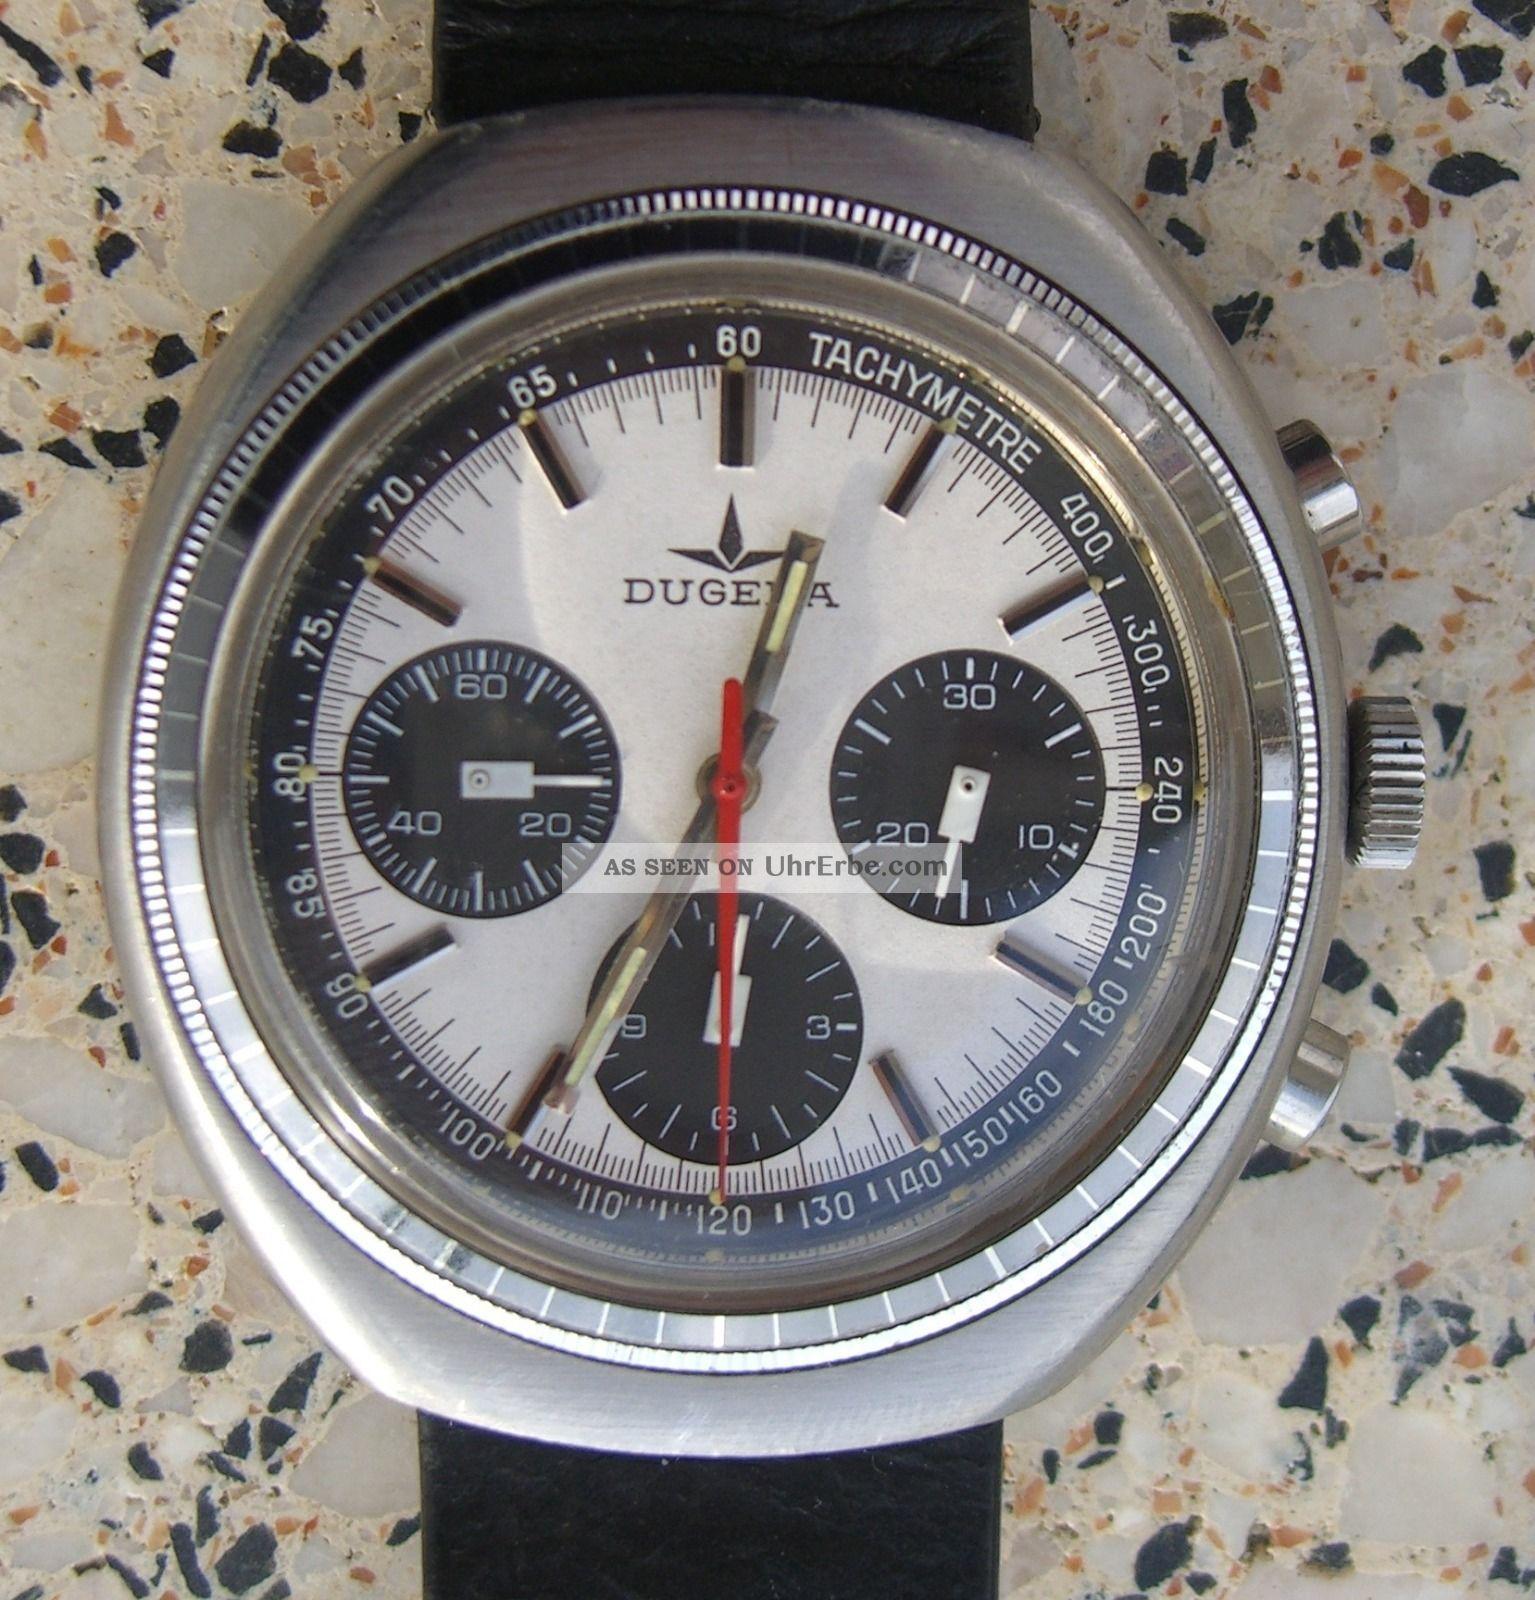 Dugena Vintage Chronograph Incabloc 14019 Waterresistant 5 Atu Armbanduhren Bild